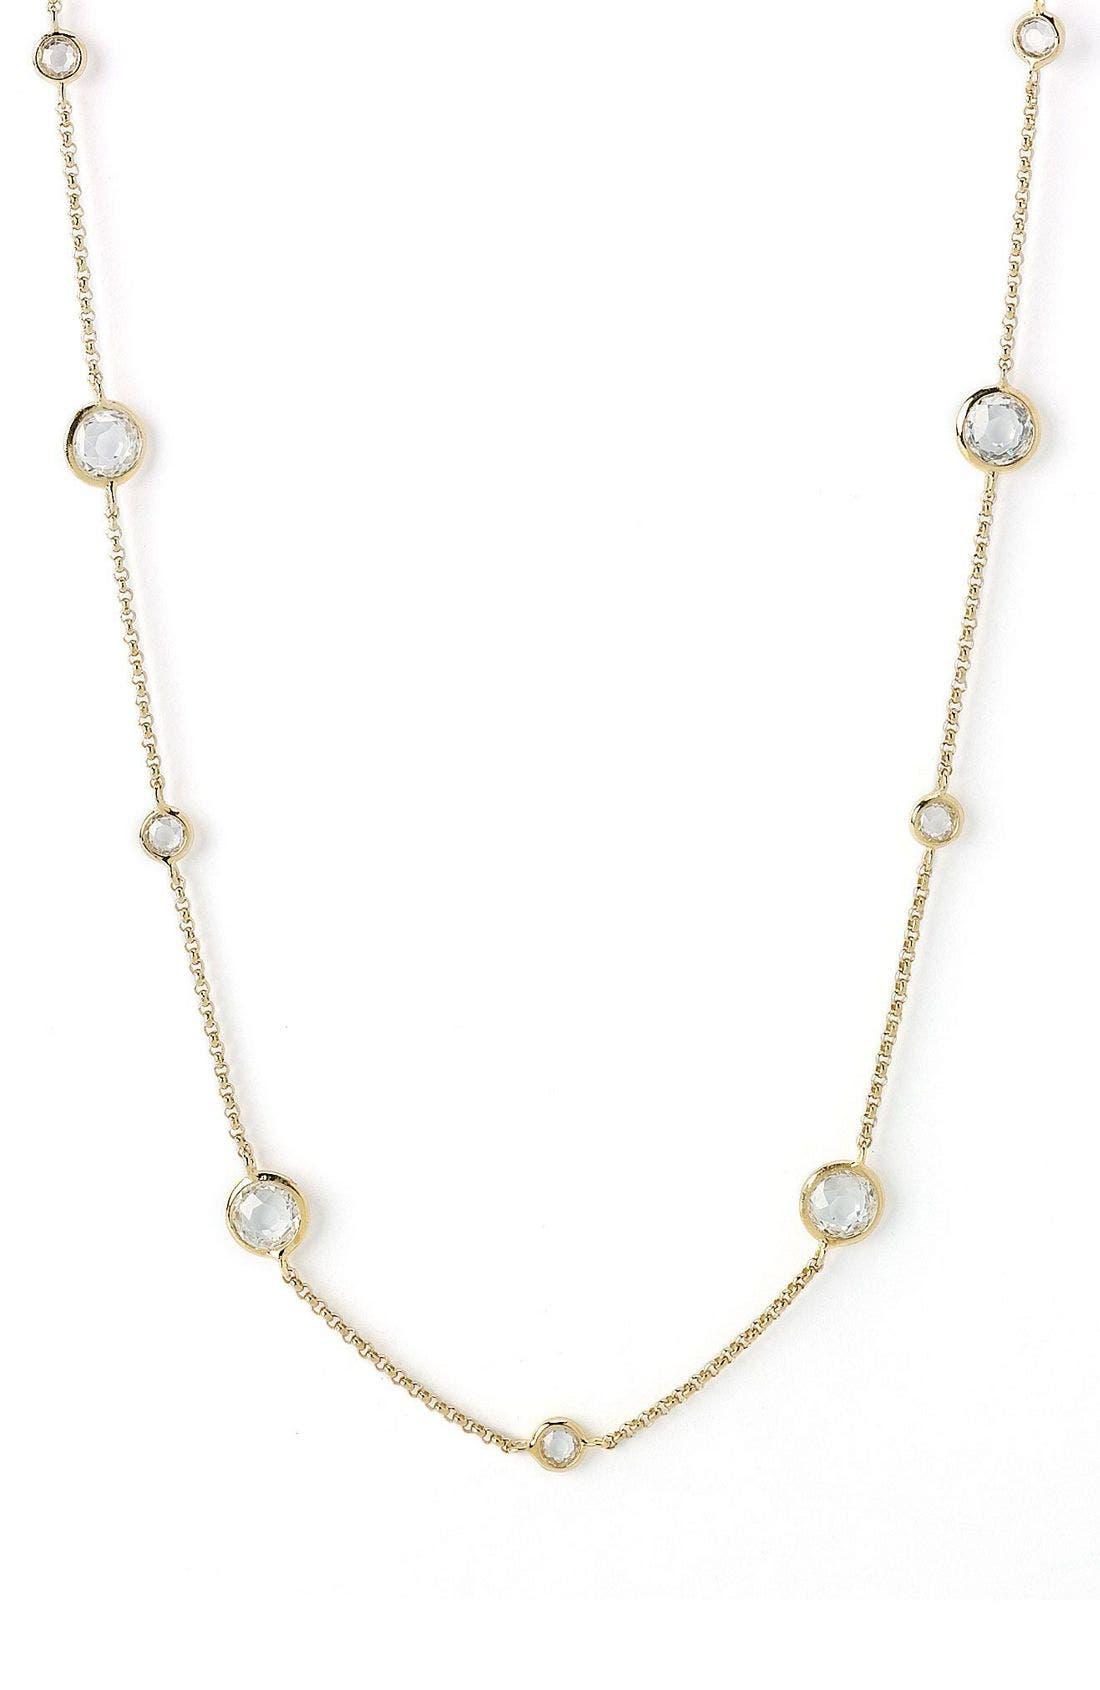 Alternate Image 1 Selected - Nadri Long Strand All Around Bezel Necklace